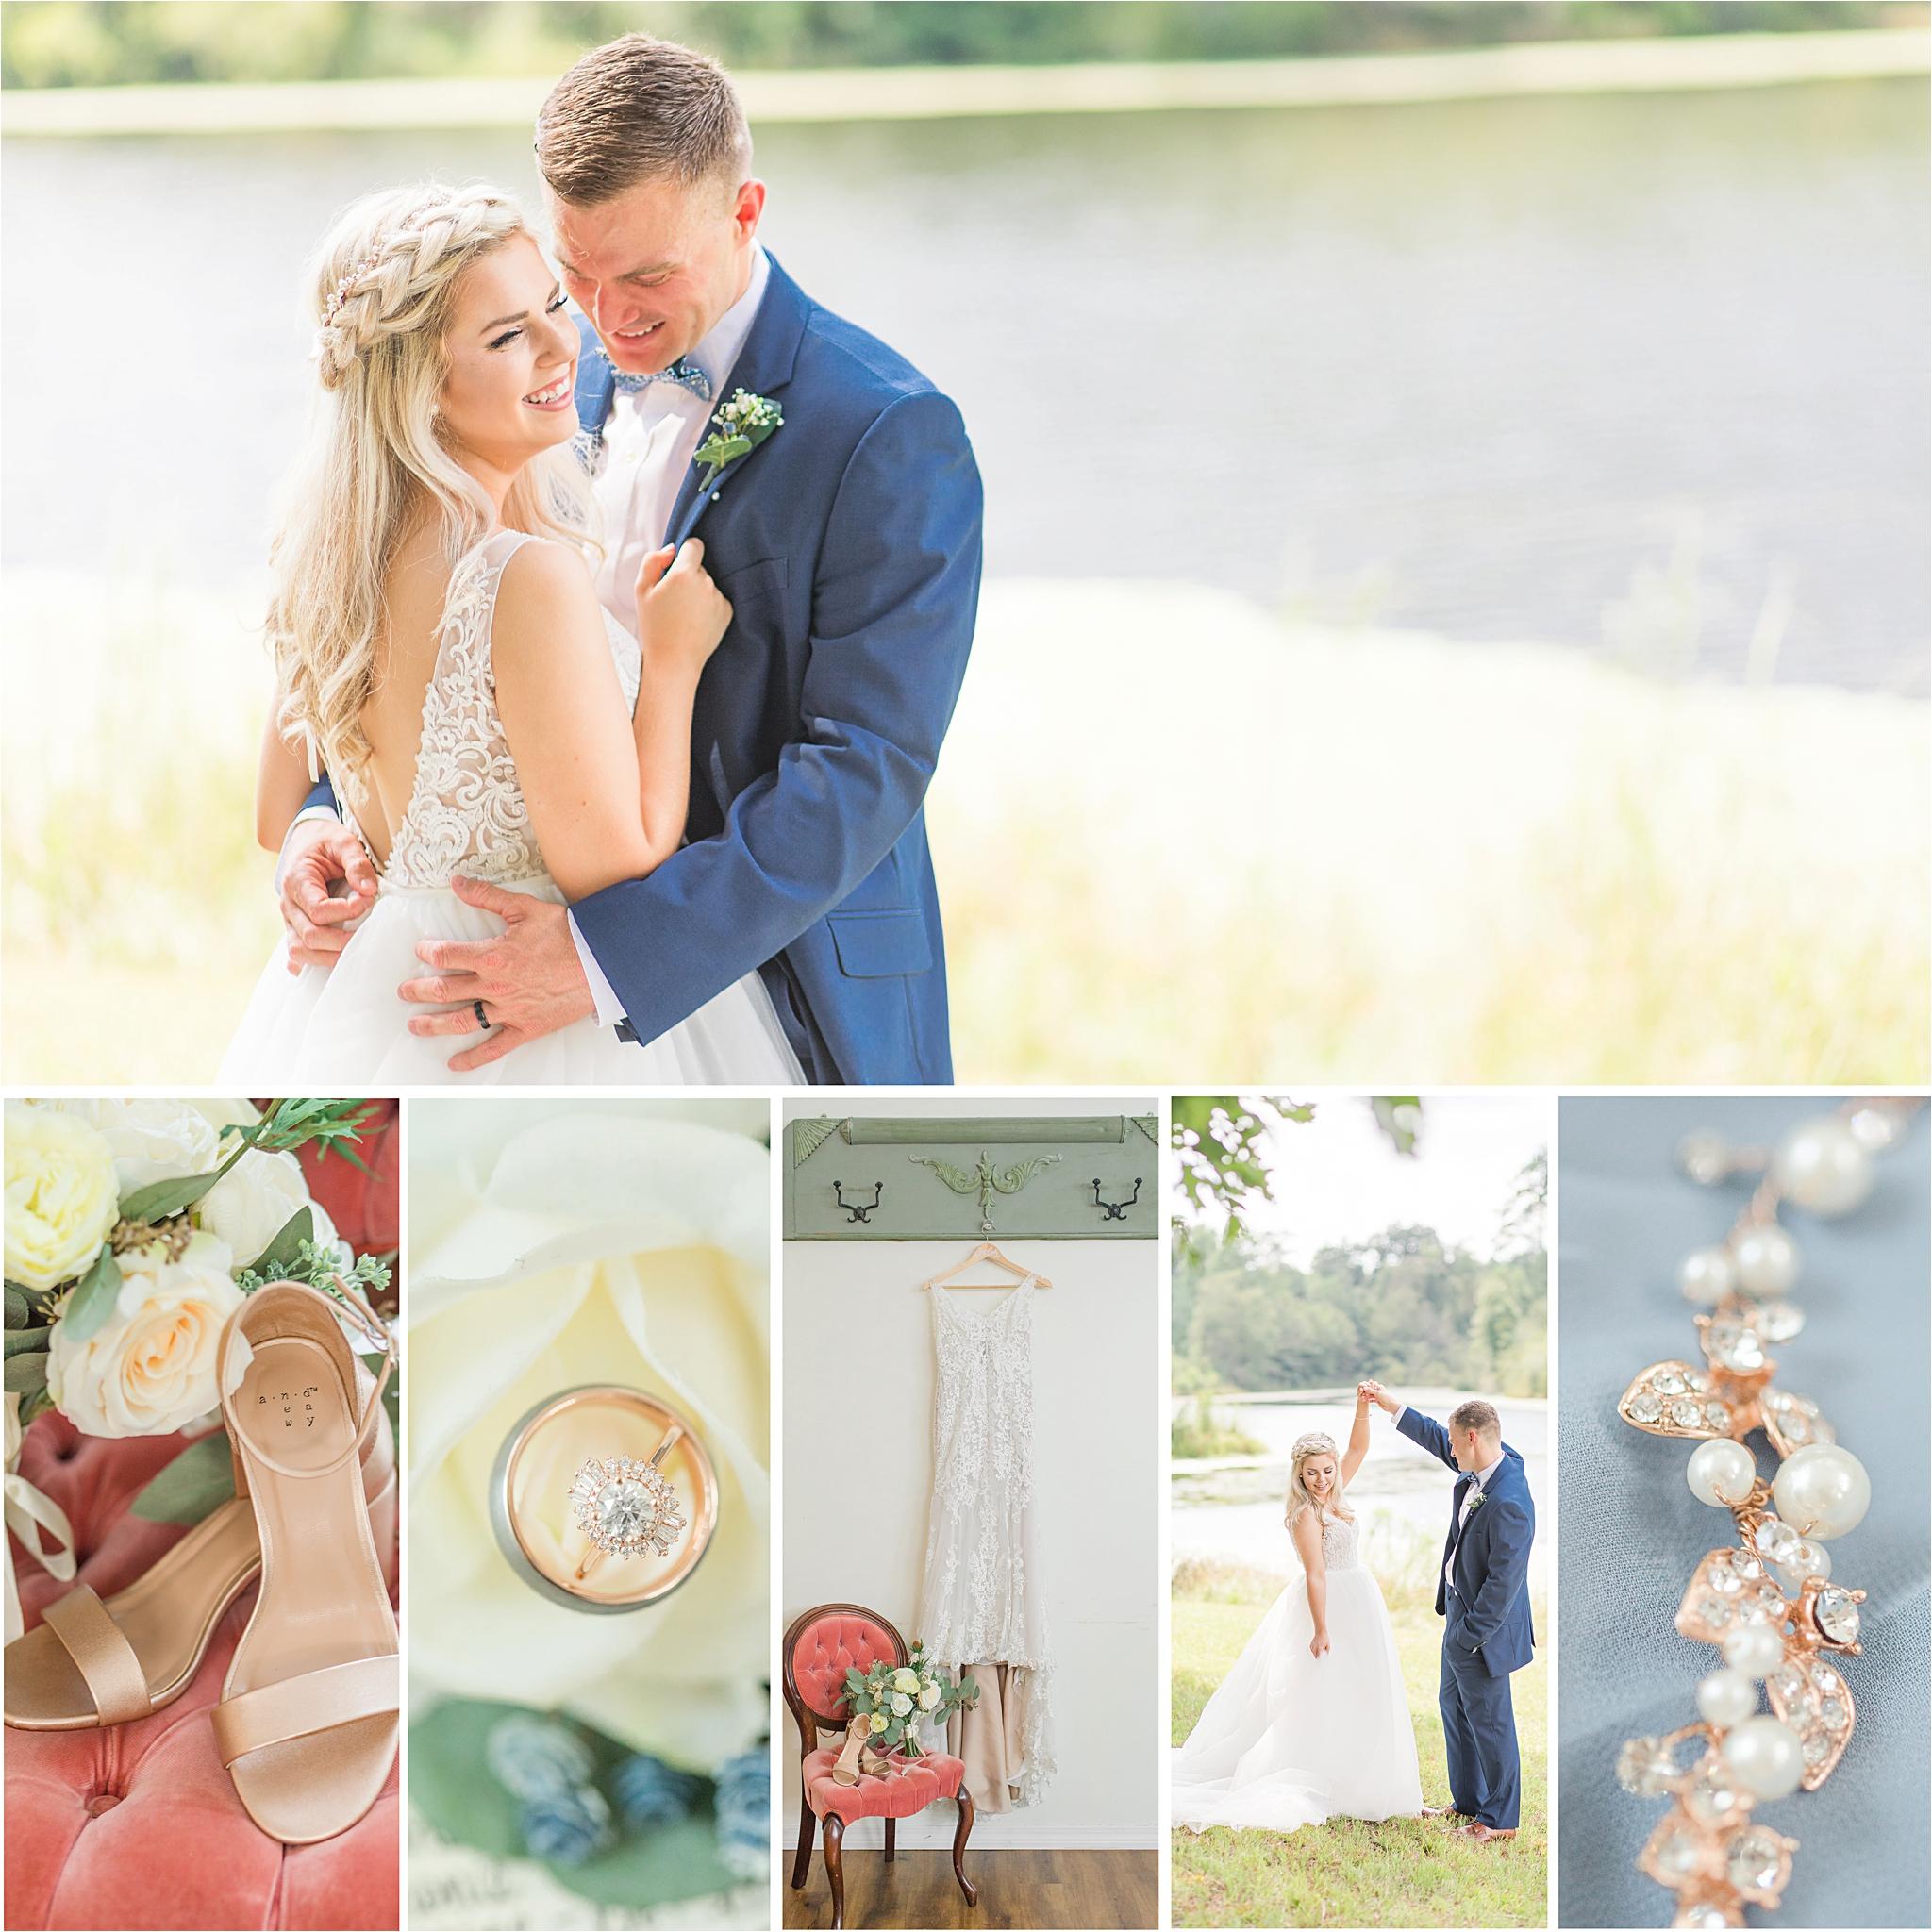 Rasberry Greene Wedding in Soso, Mississippi